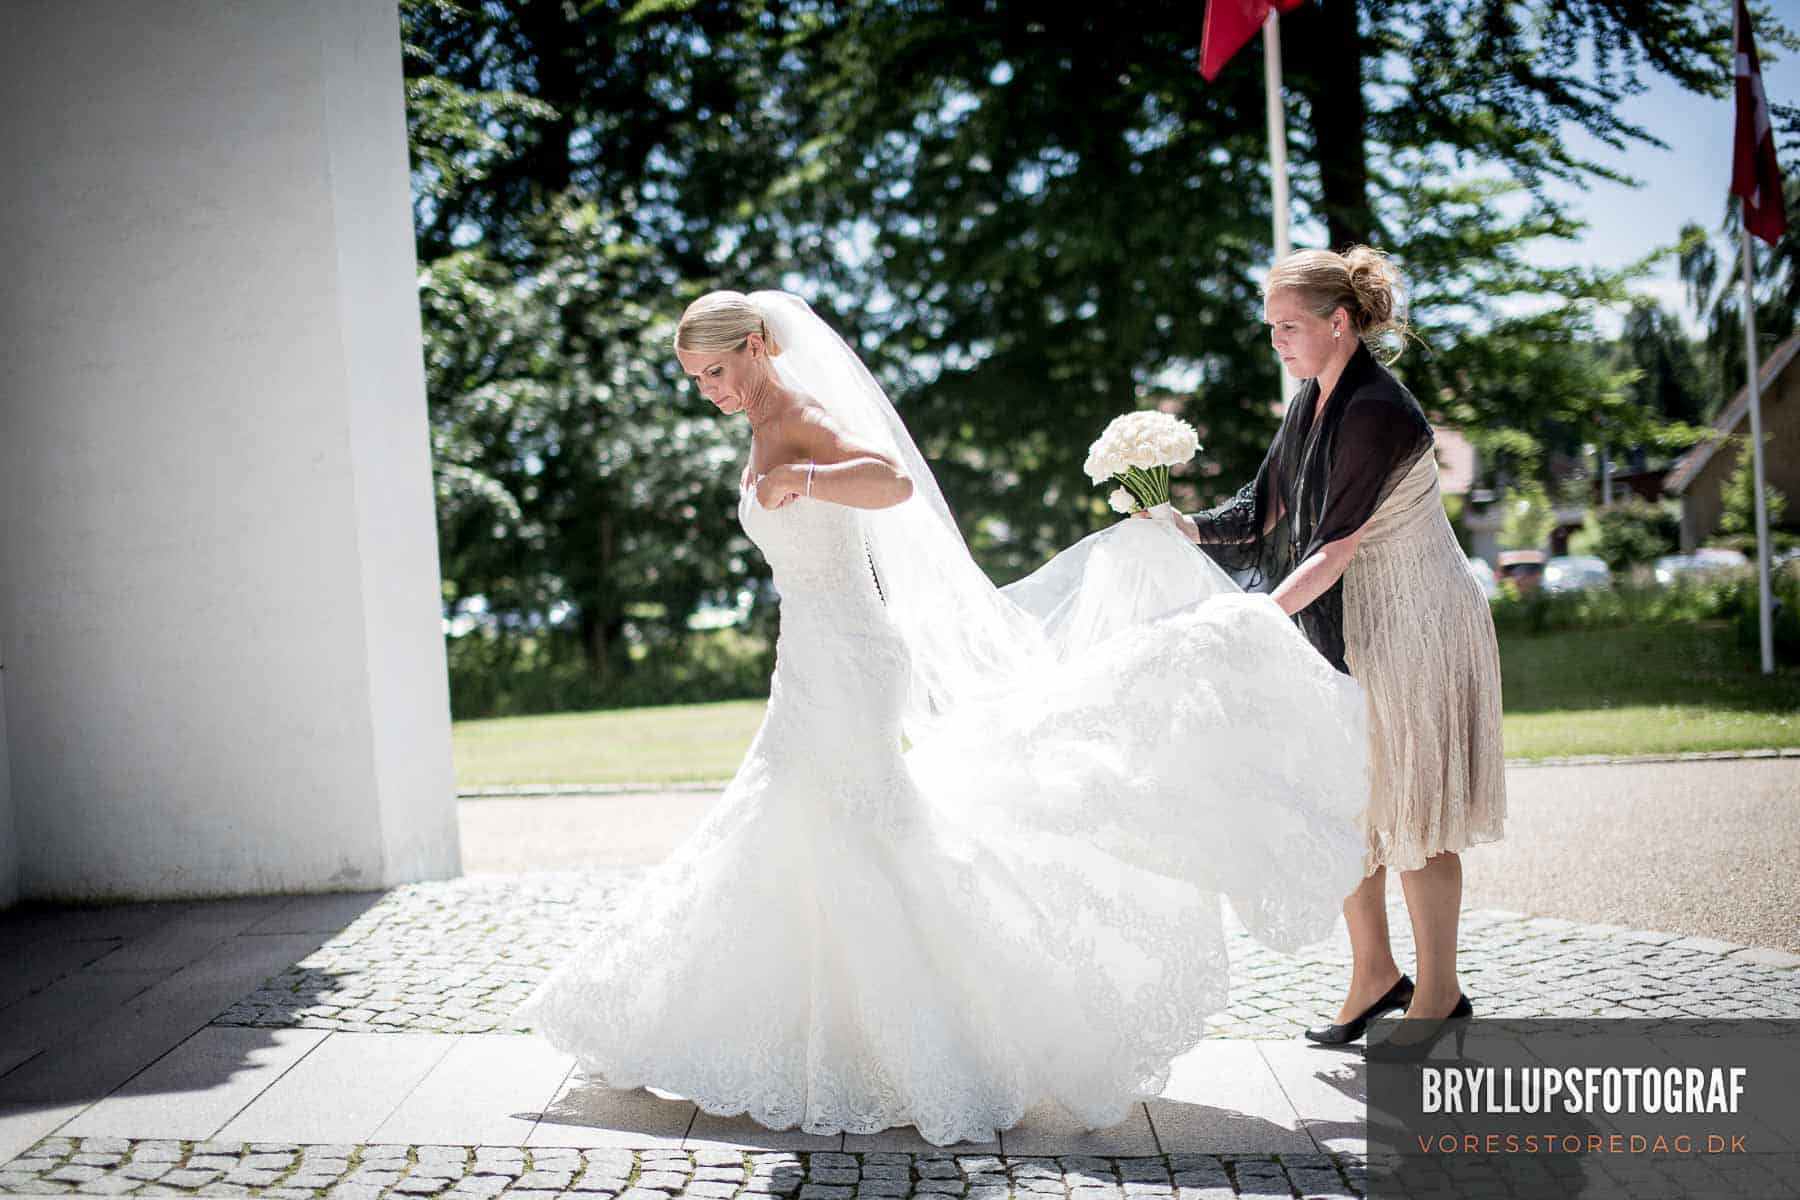 Mølholm Kirke bruden ankommer